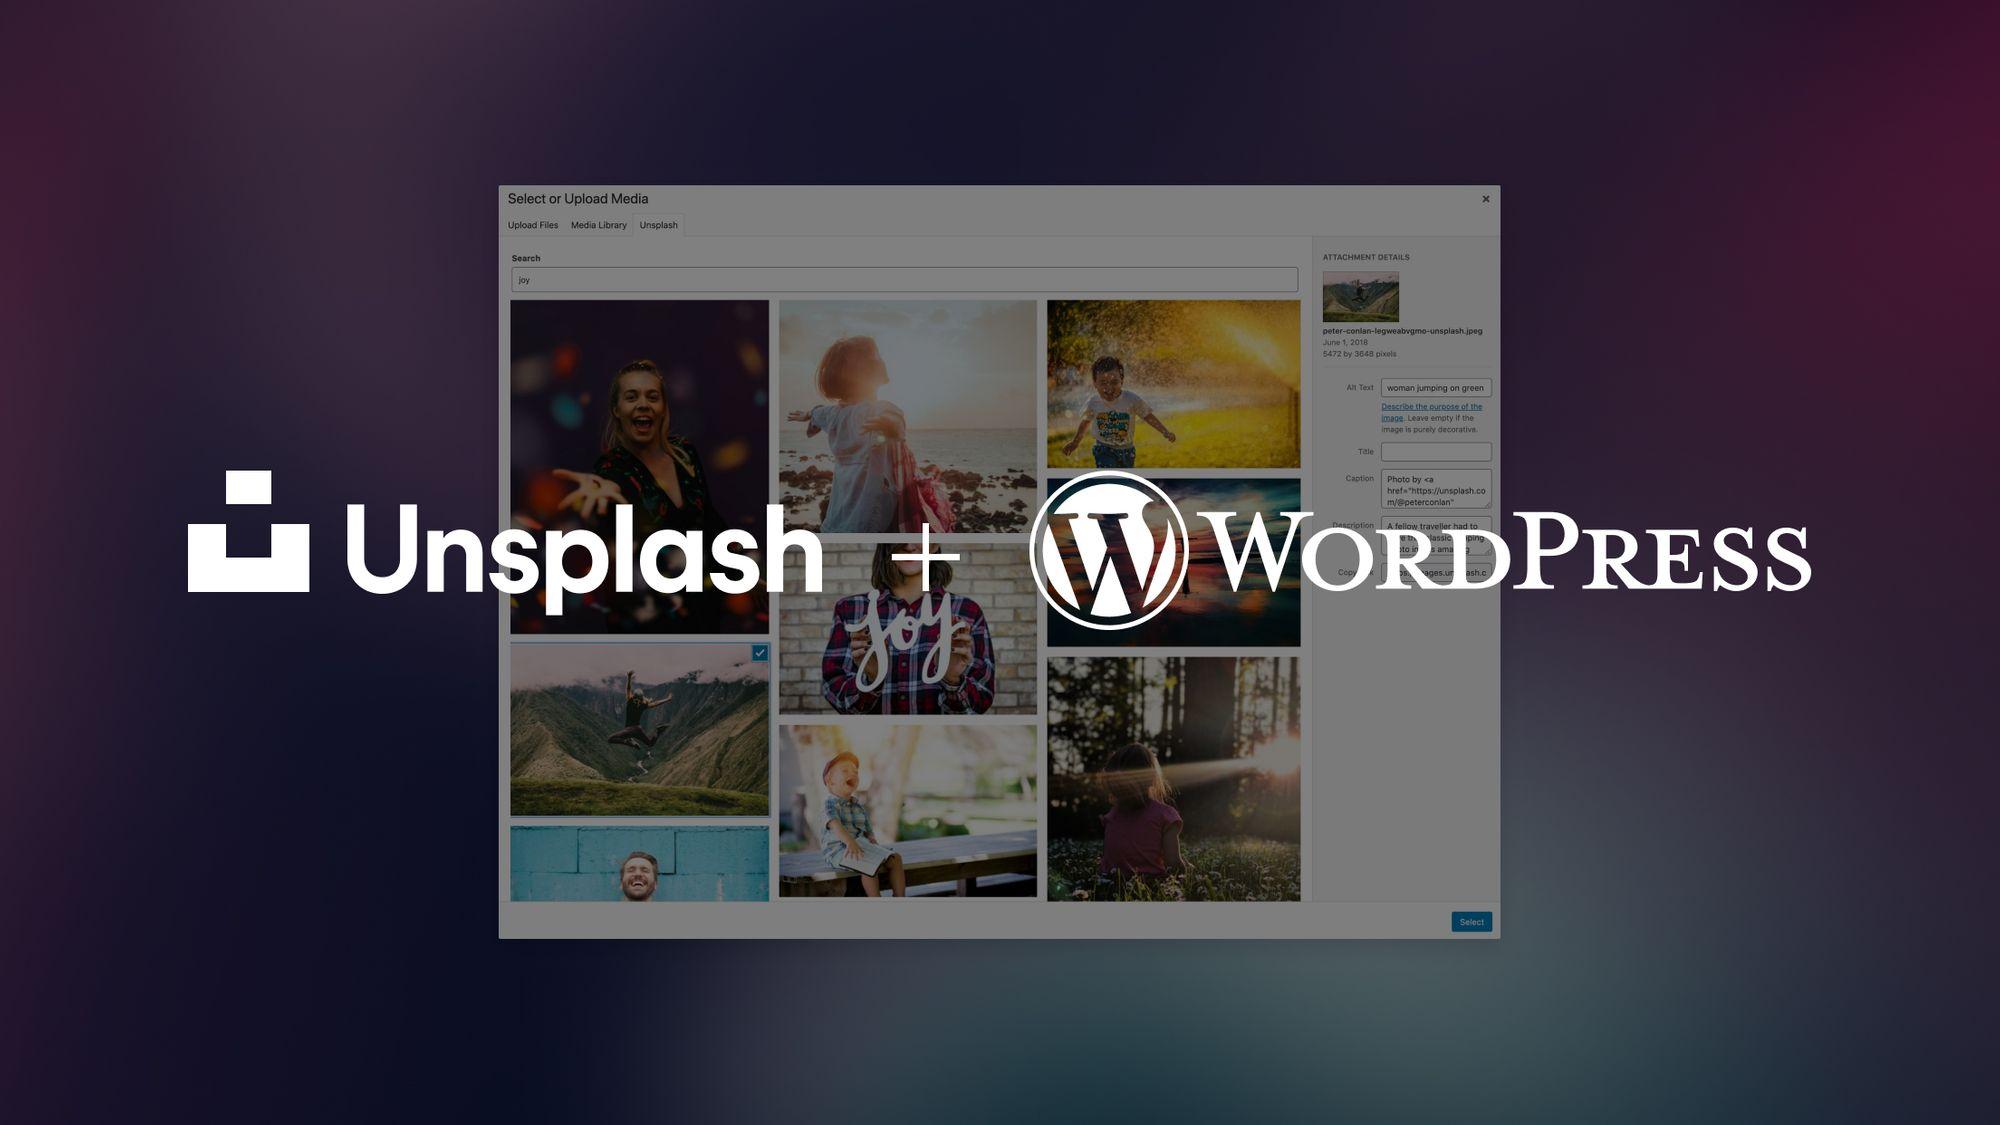 Unsplash logo + Wordpress logo